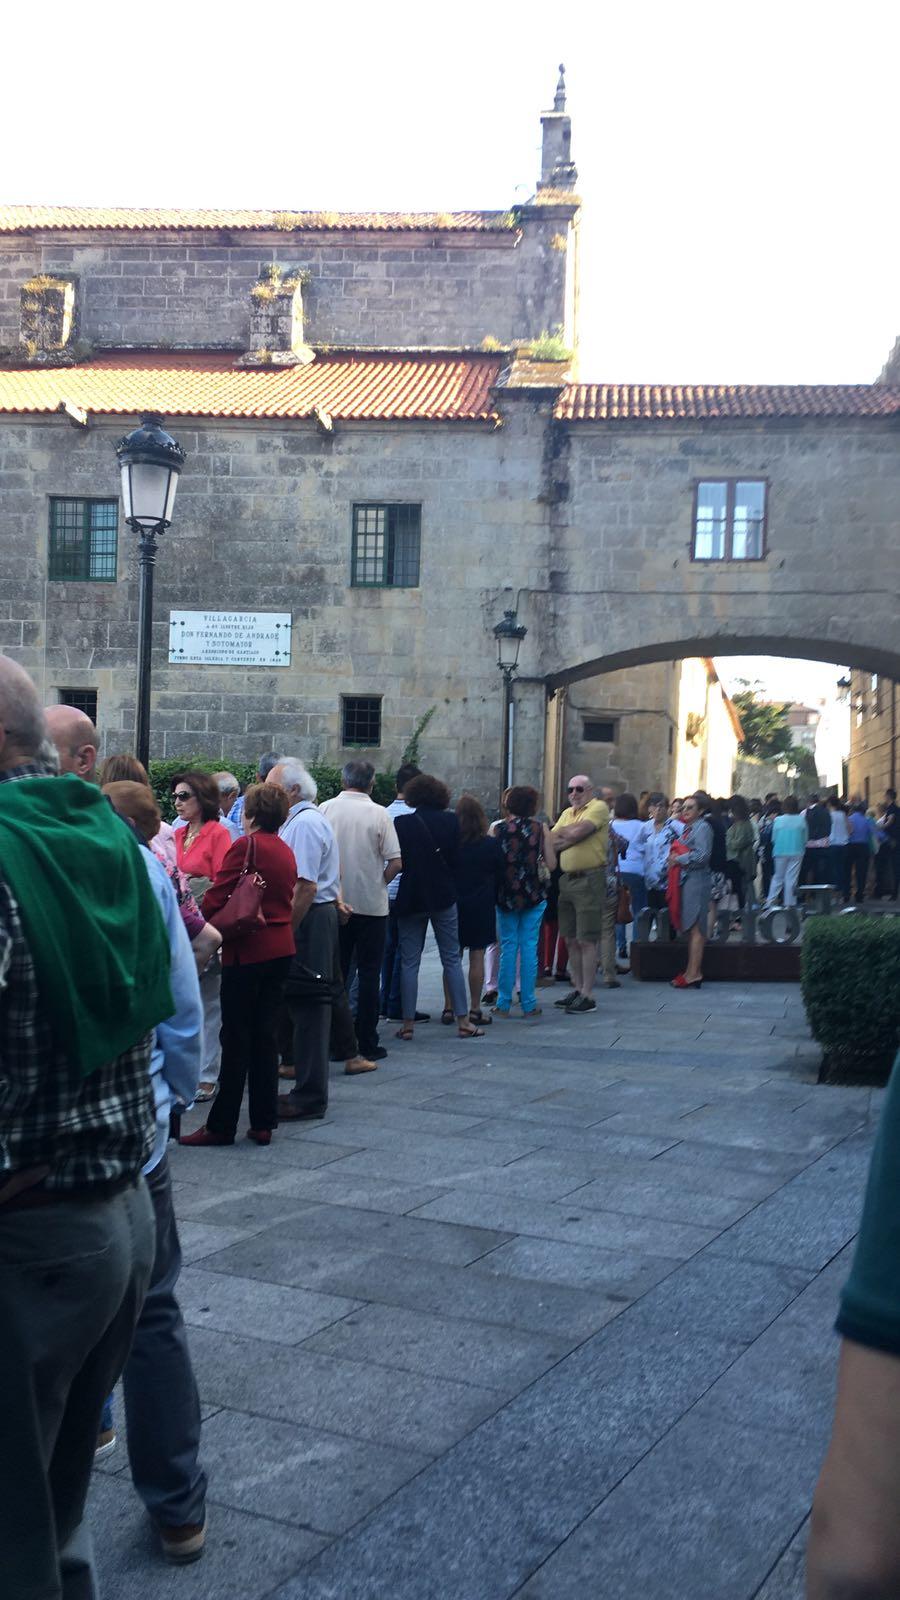 Day 5 - Convento de Vista Alegre